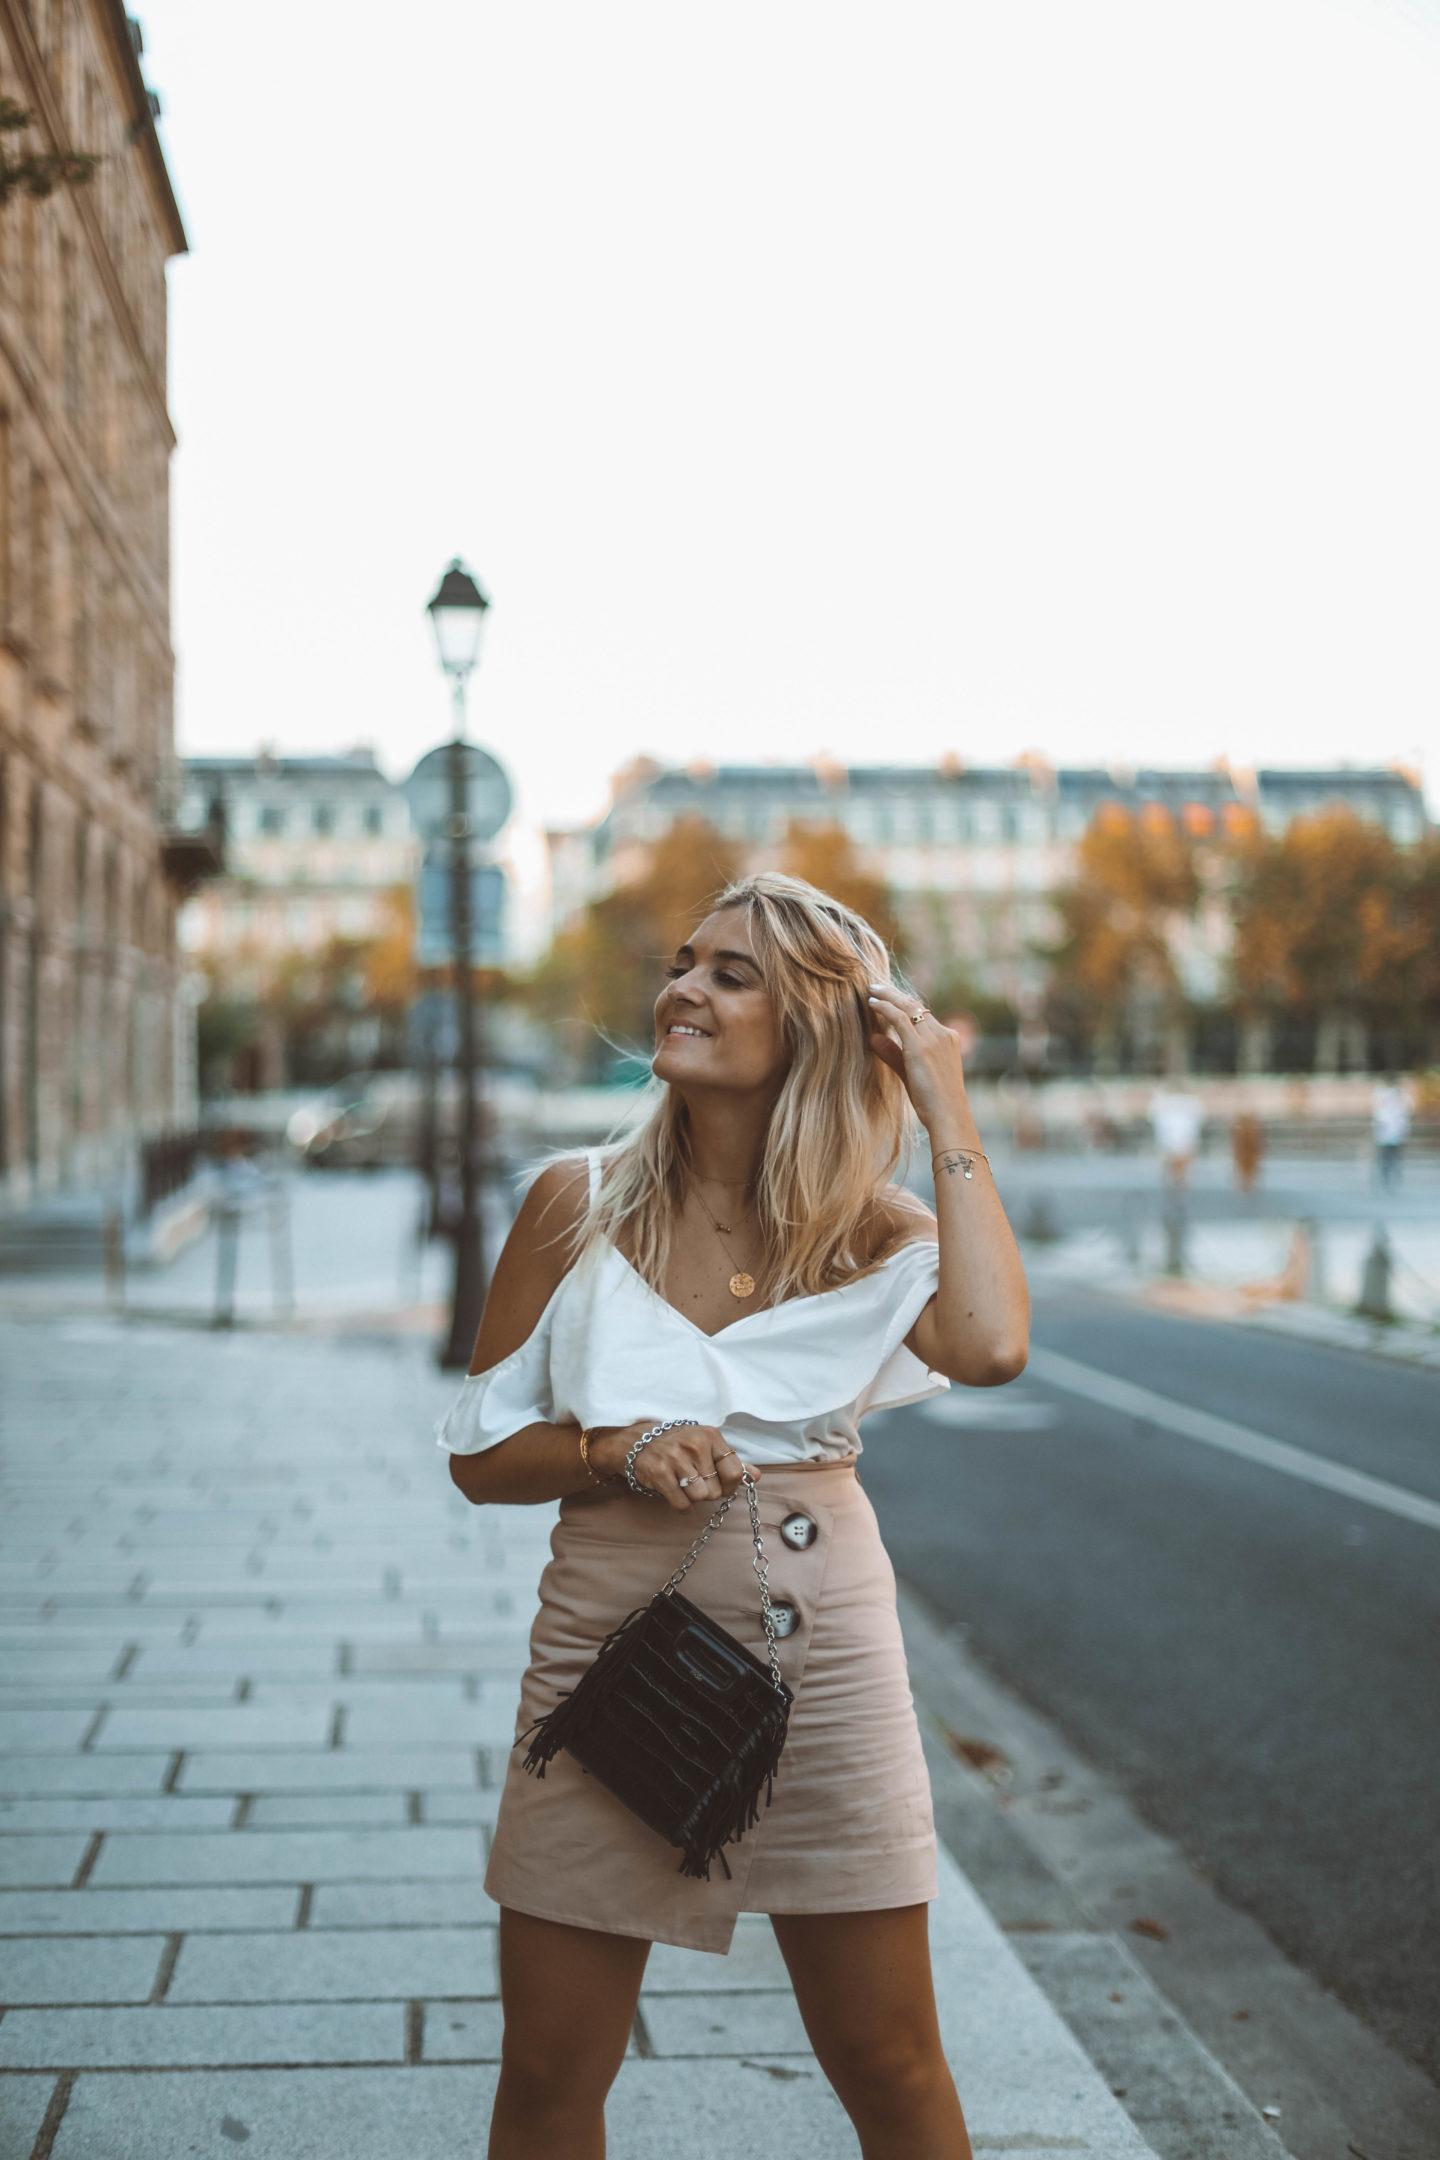 Bijoux Maje - Blondie baby blog mode Paris et voyages